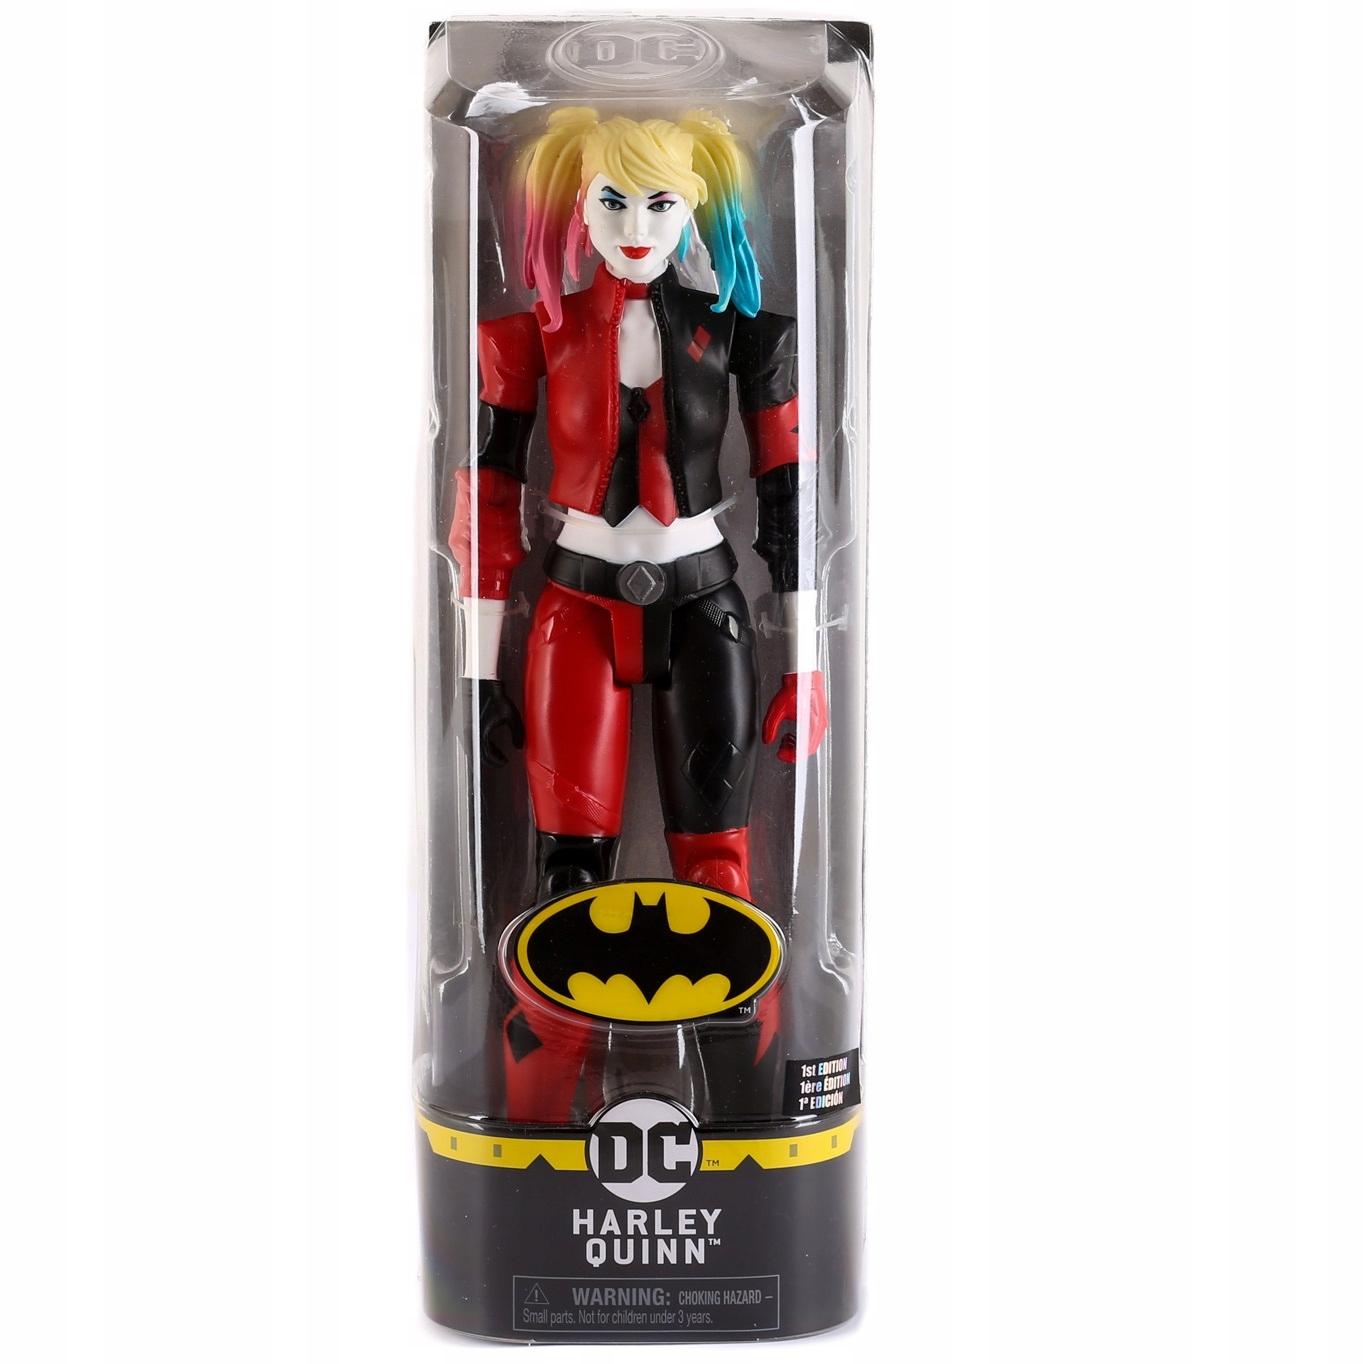 DUŻA FIGURKA HARLEY QUINN 30cm SPINMASTER BATMAN Bohater Batman